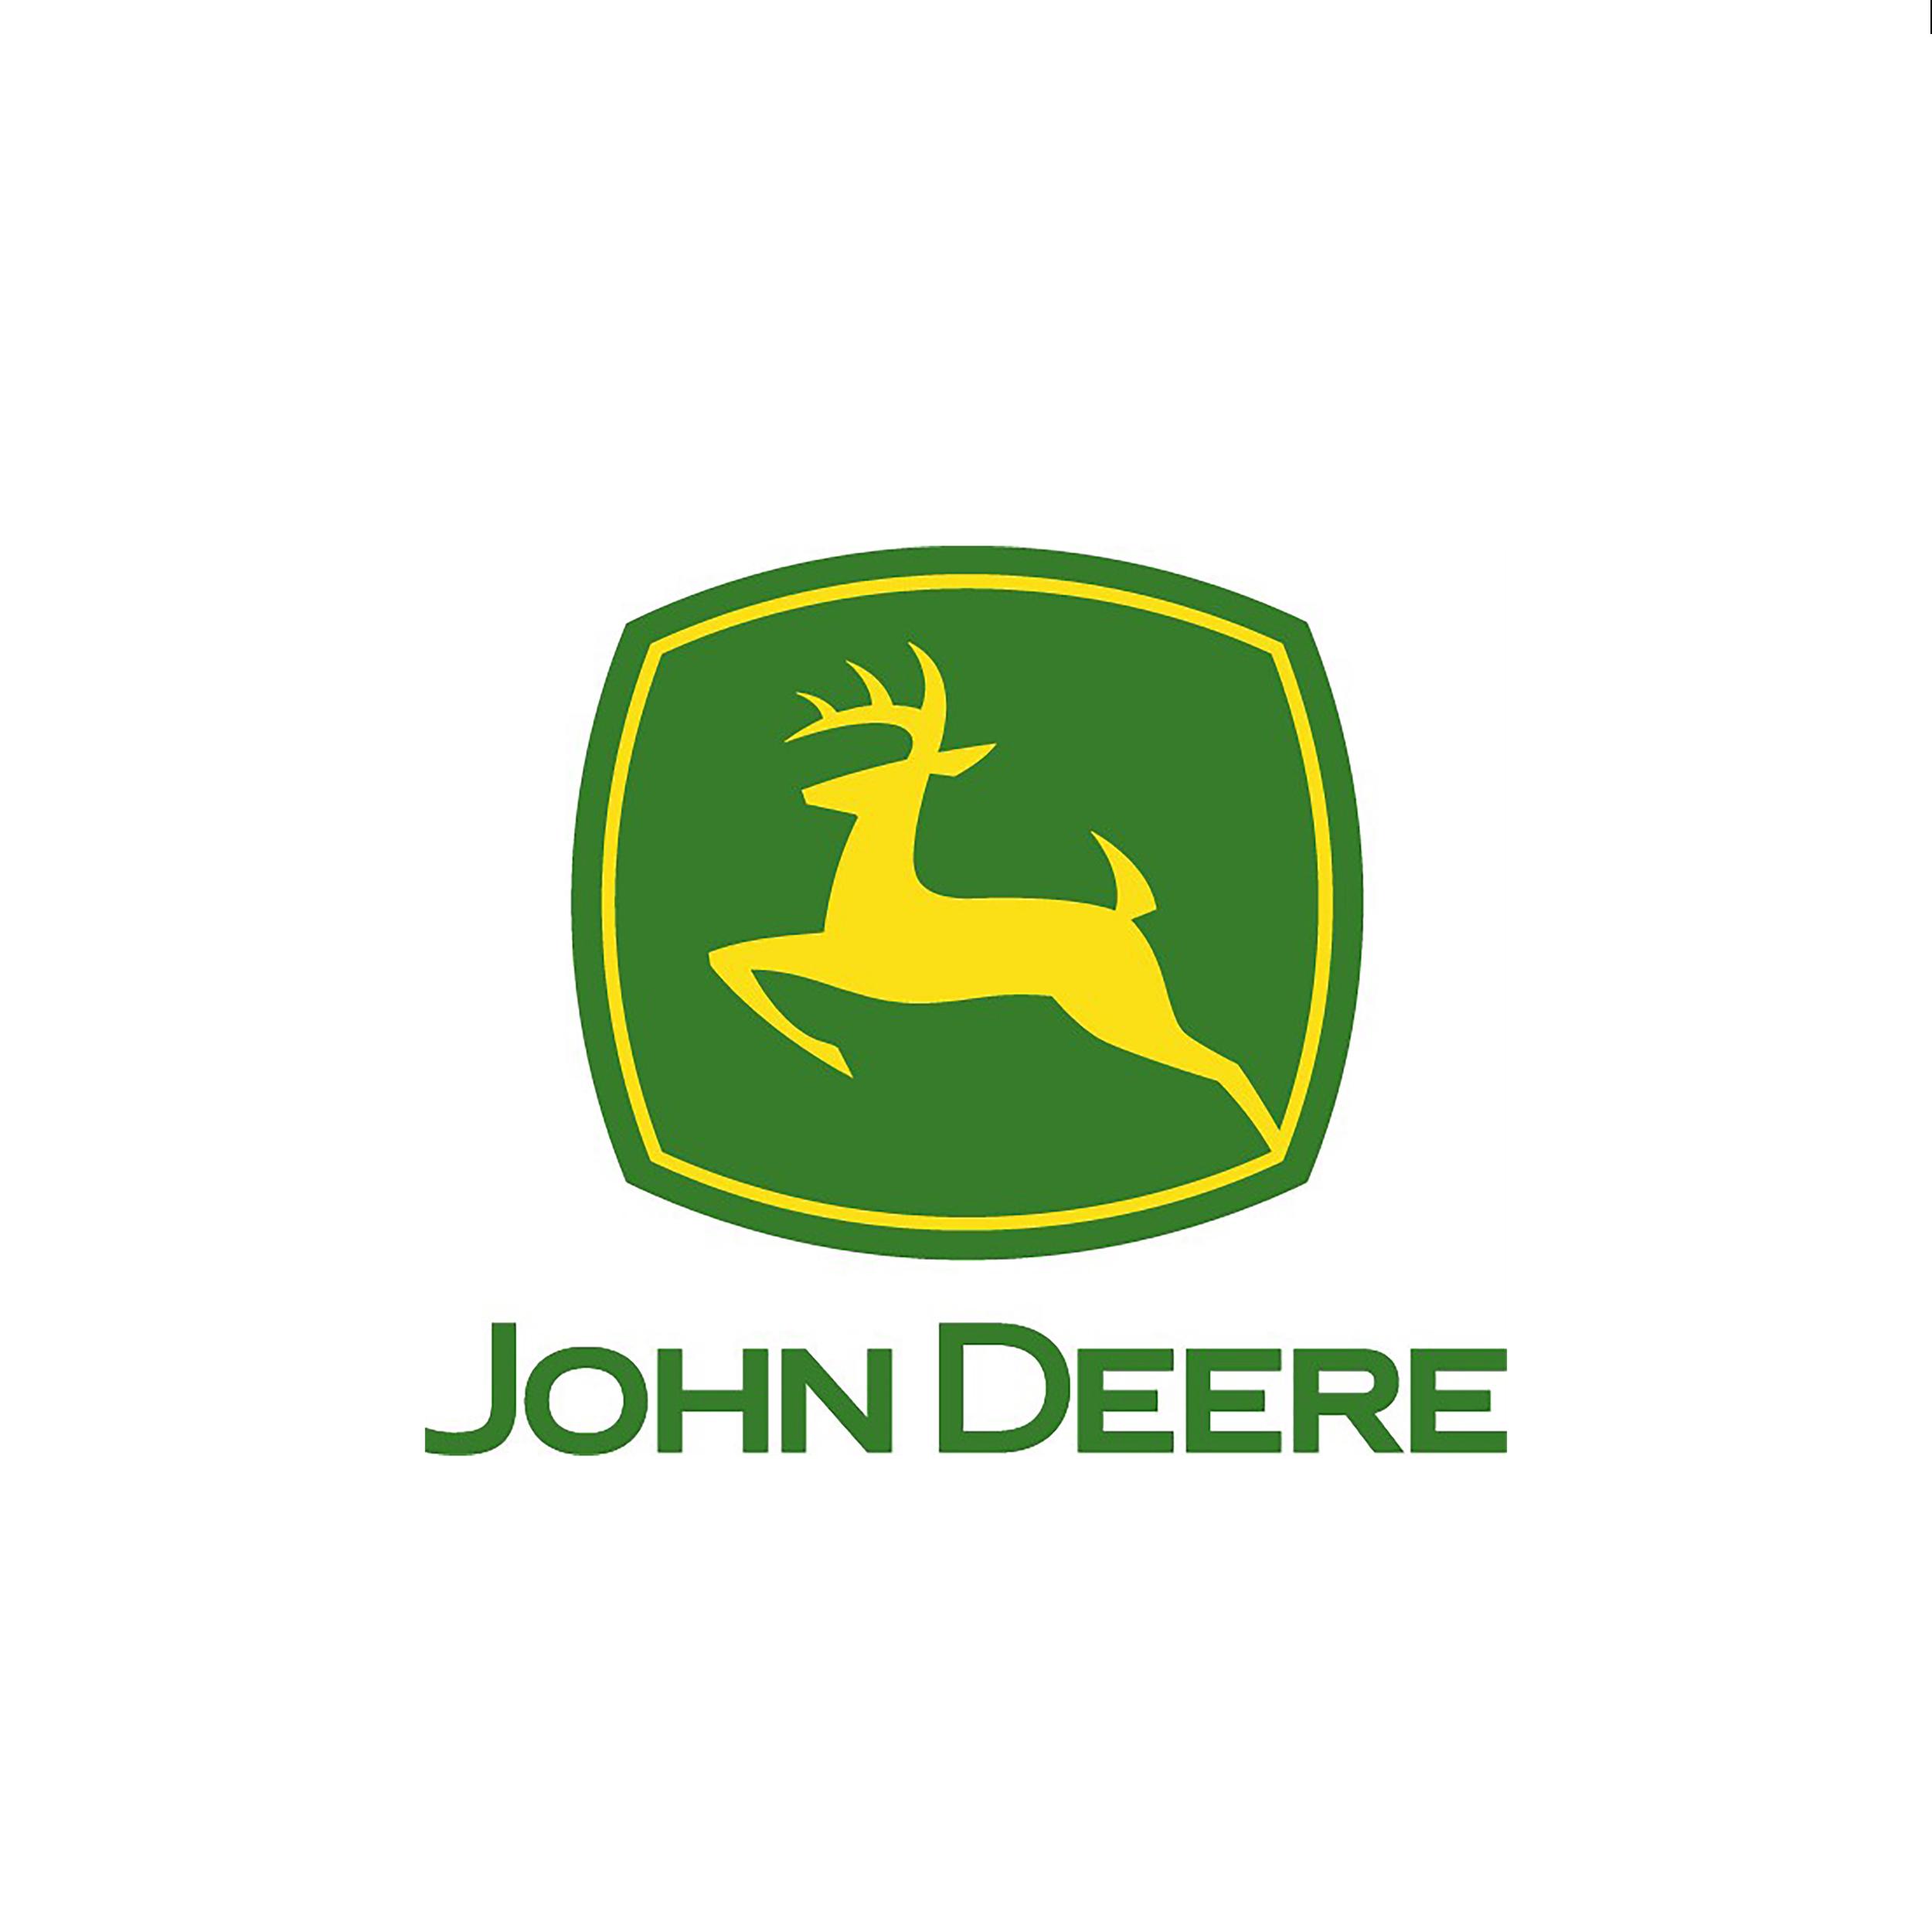 JohnDeerelogo.png